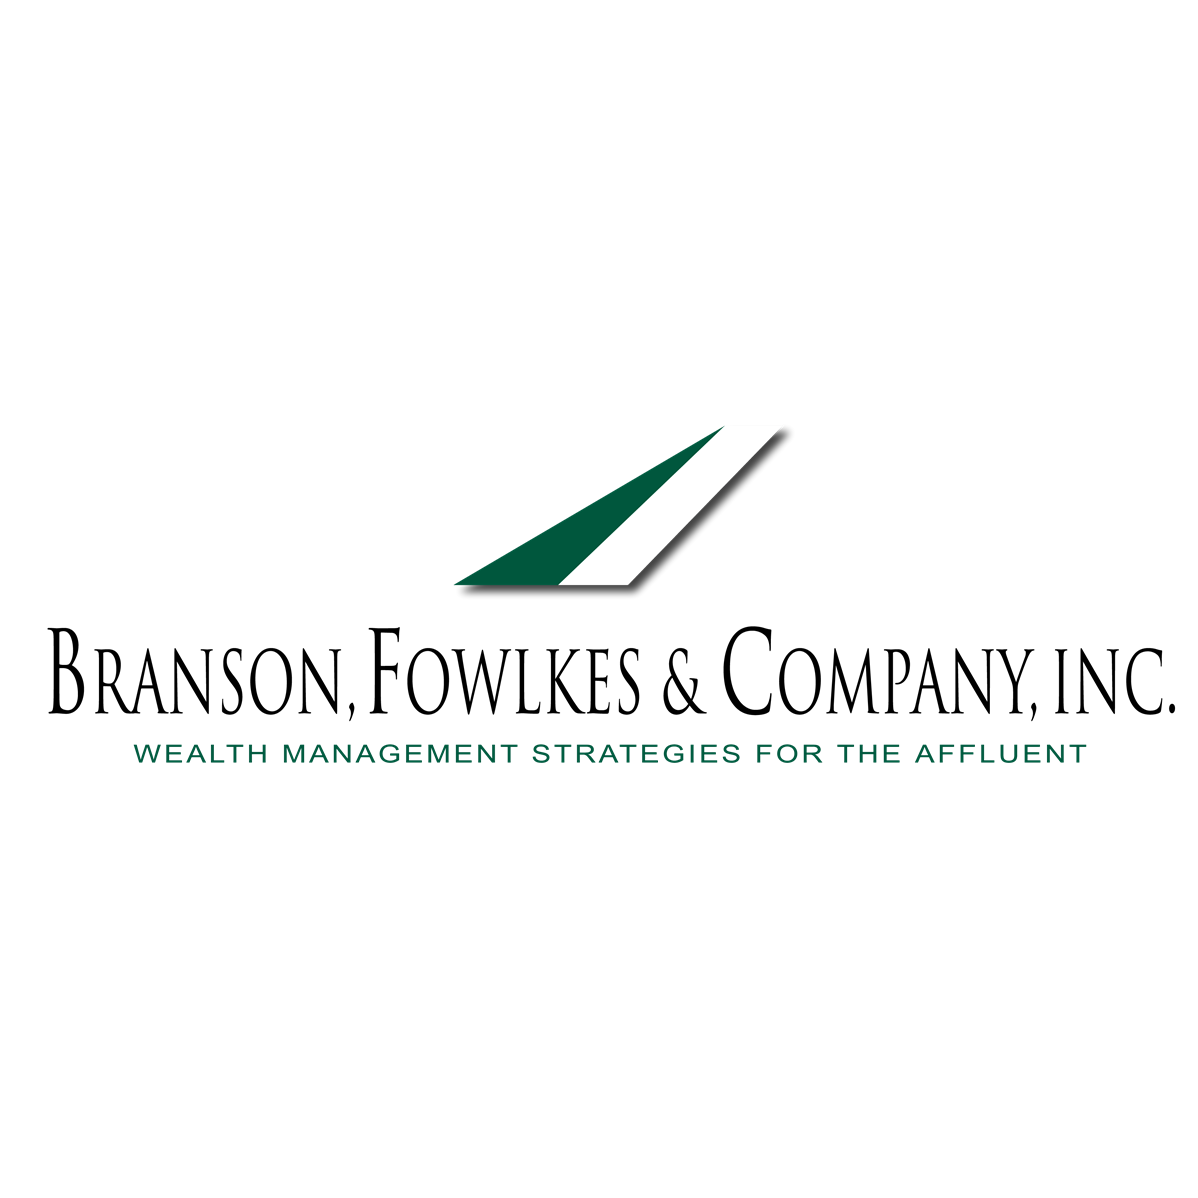 Branson Fowlkes & Company, Inc.